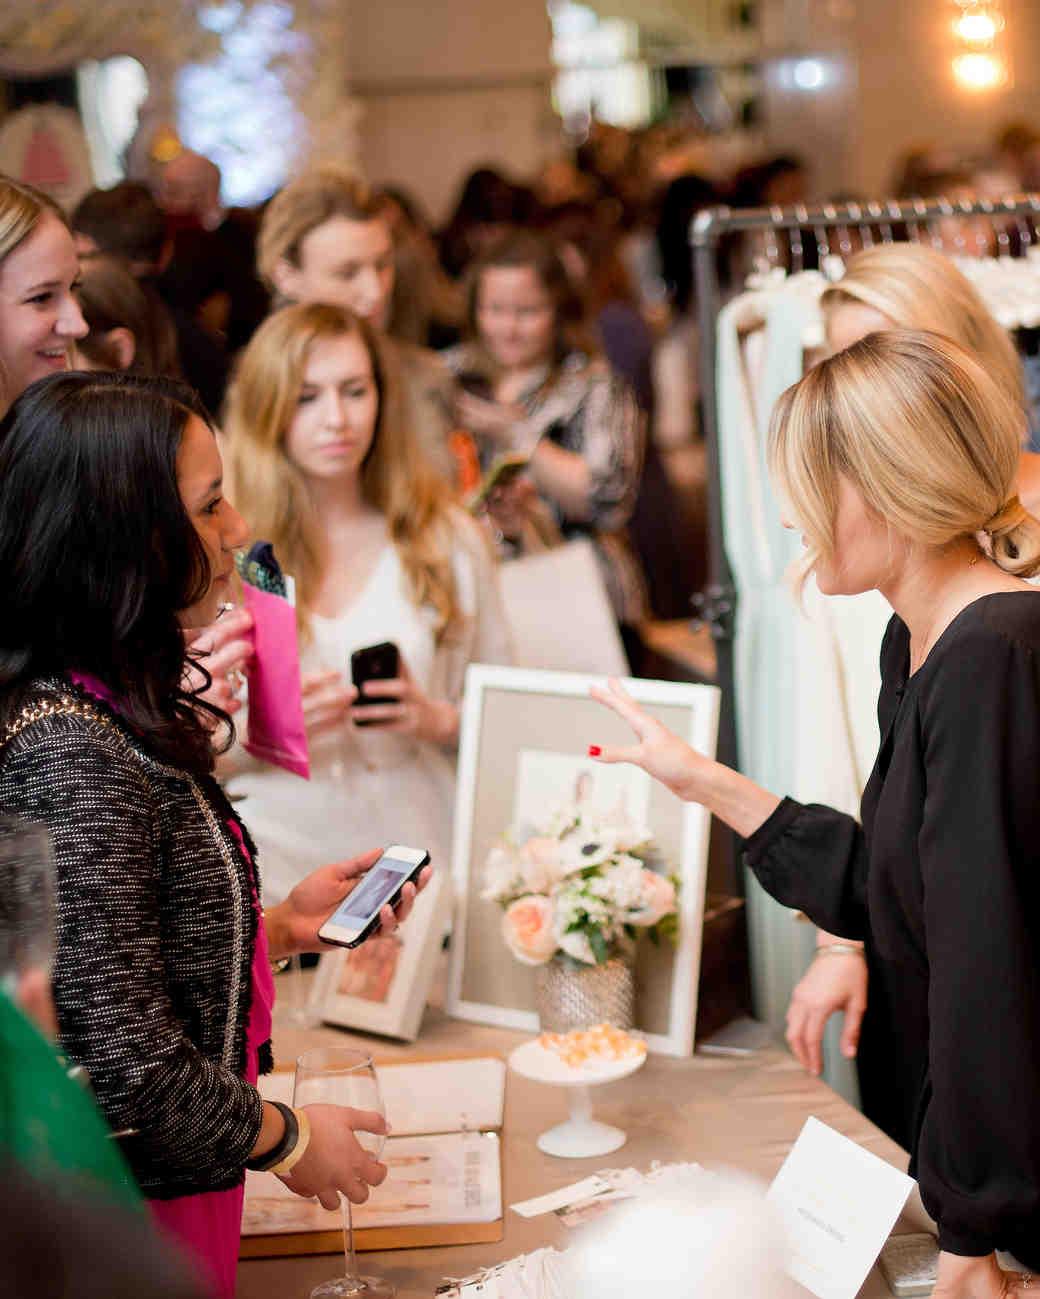 msw-chicago-party15-081-lauren-conrad-talking-to-brides-0315.jpg